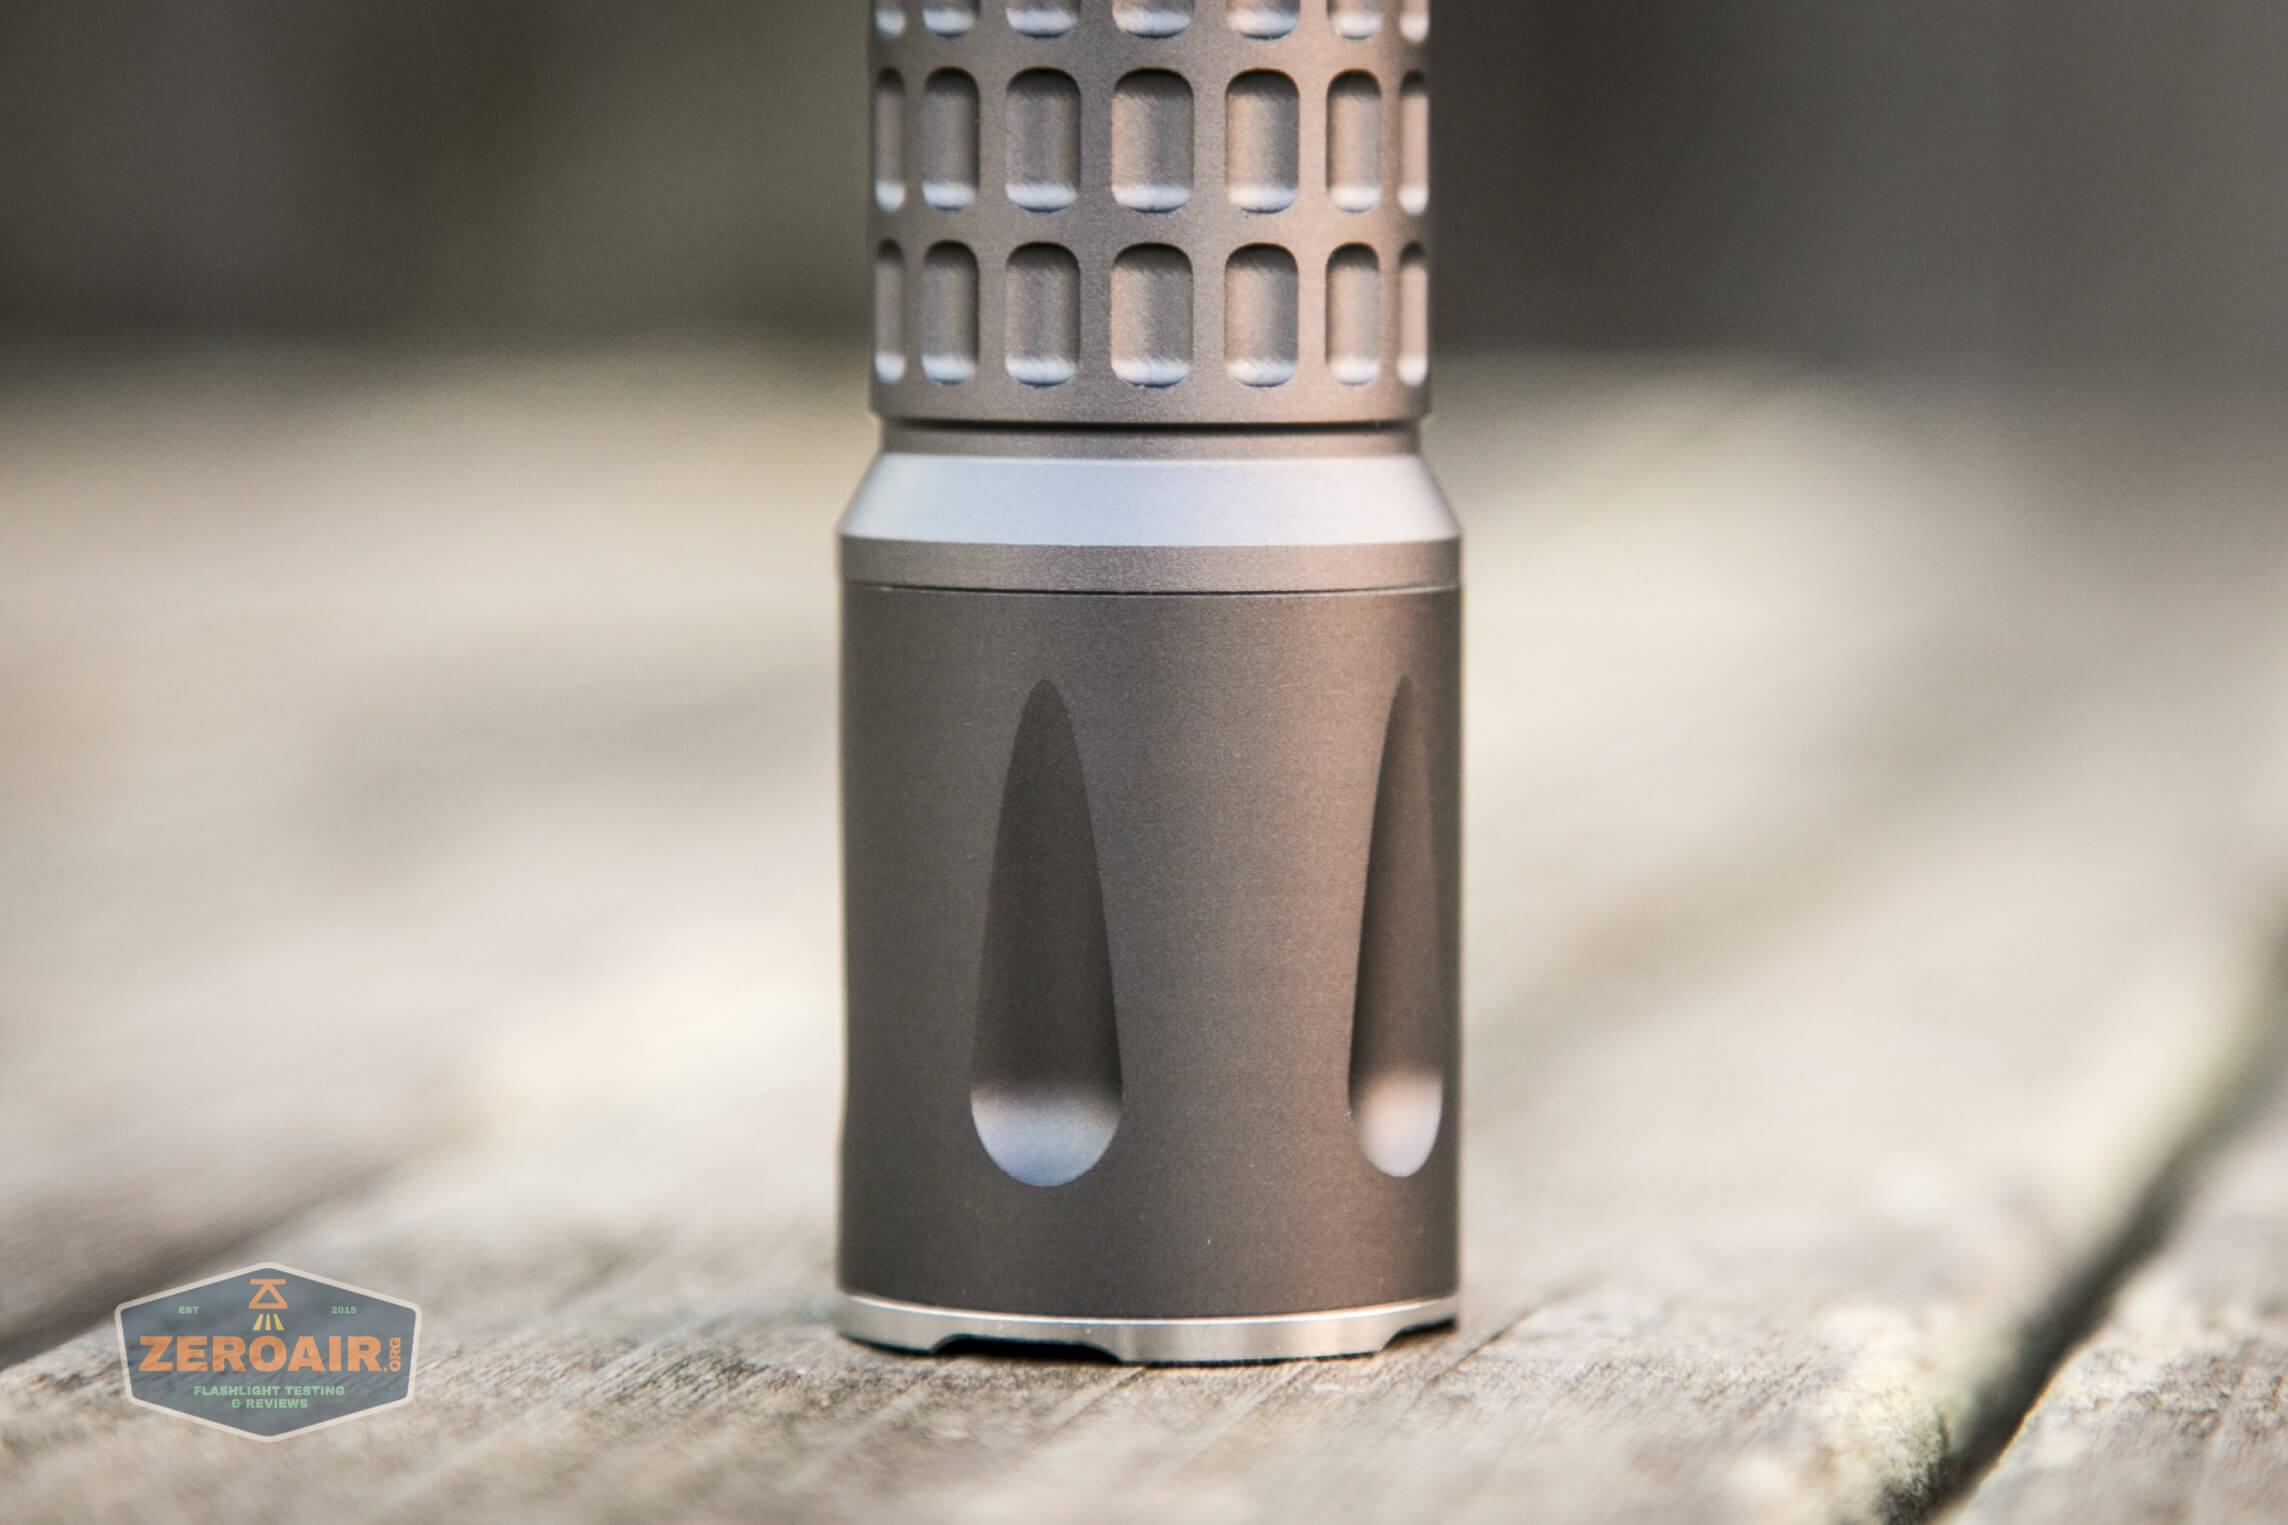 countycomm reylight 21700 quad emitter flashlight showing head and mismatched anodization